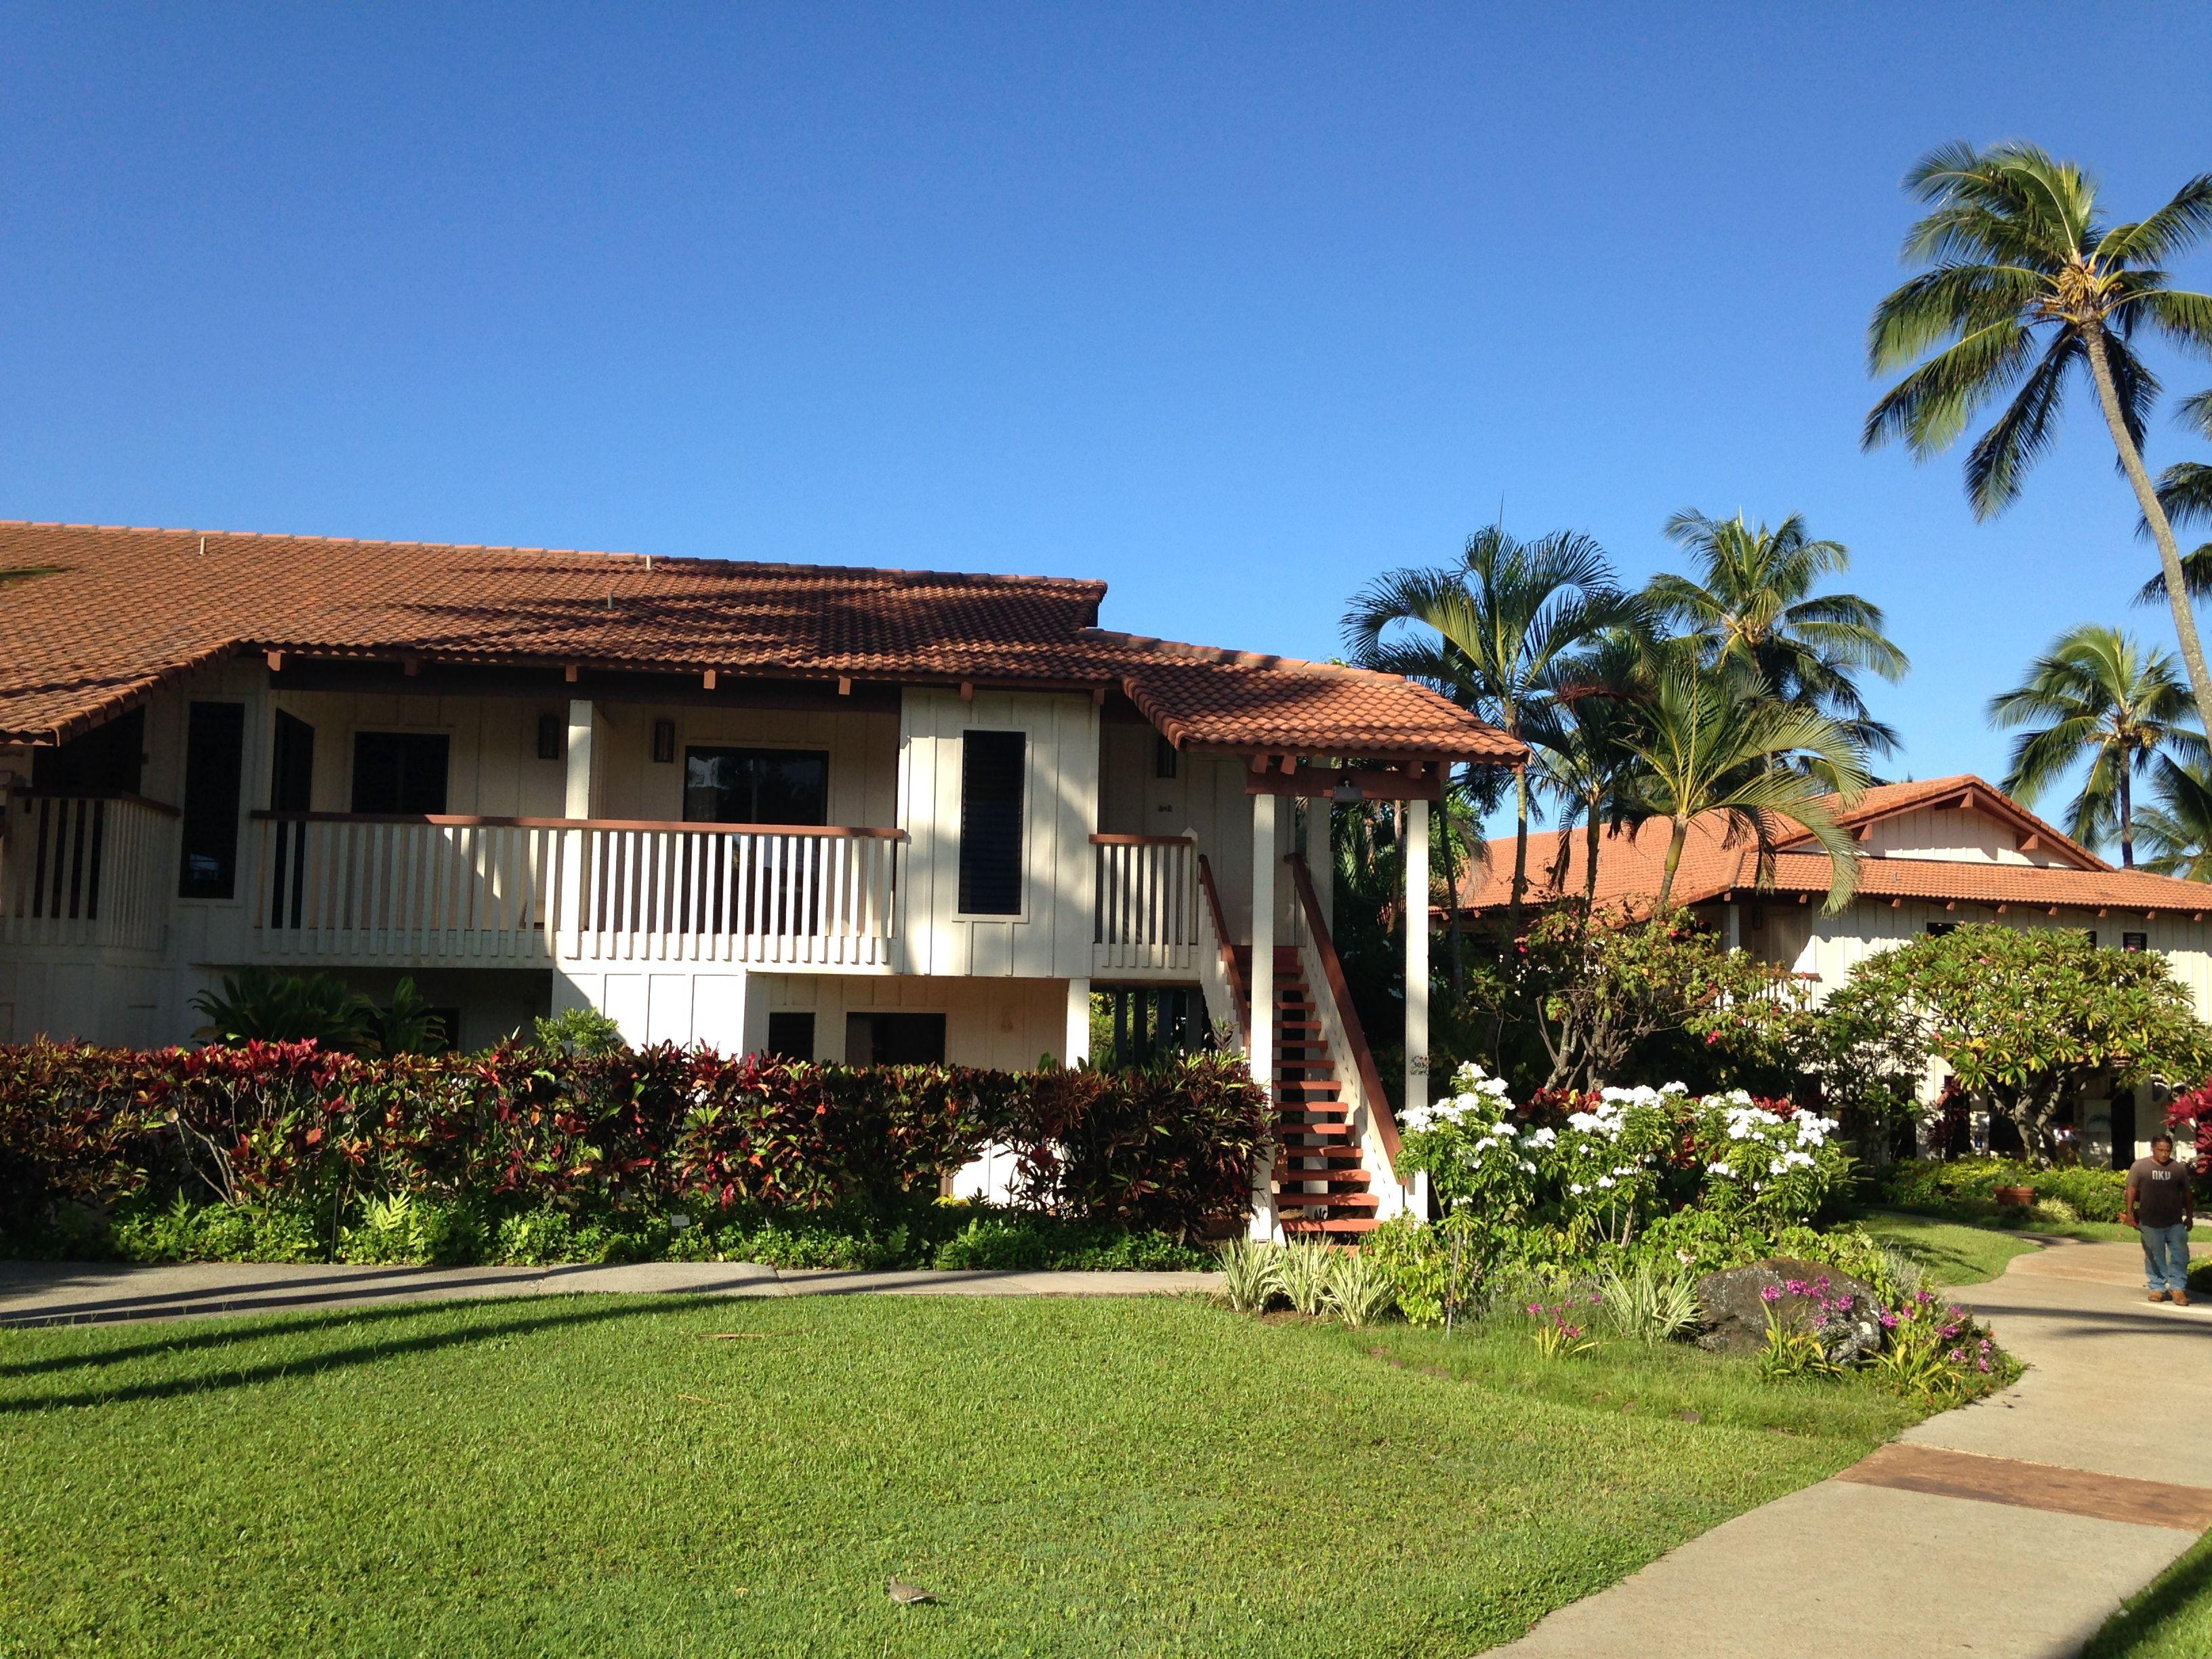 30 condos in 30 days Explore Kauai Real Estate with